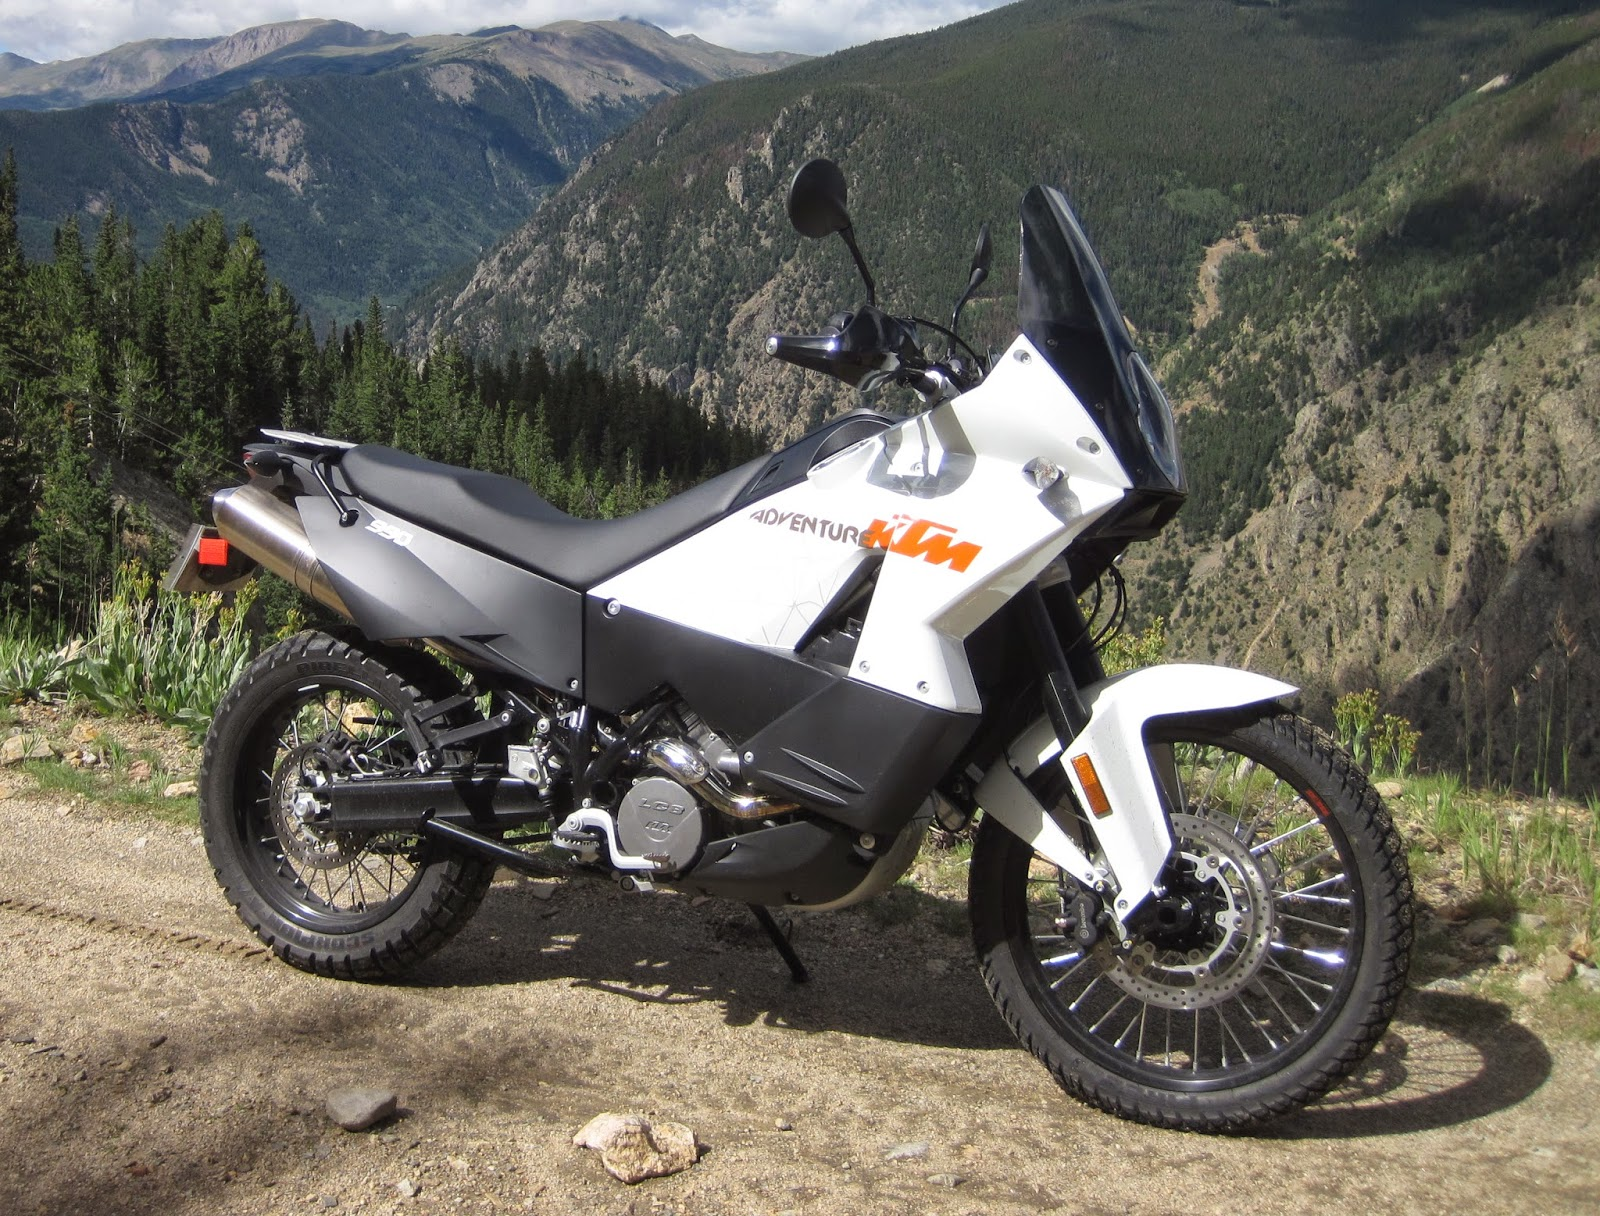 KTM 990 Adventure Bikes price